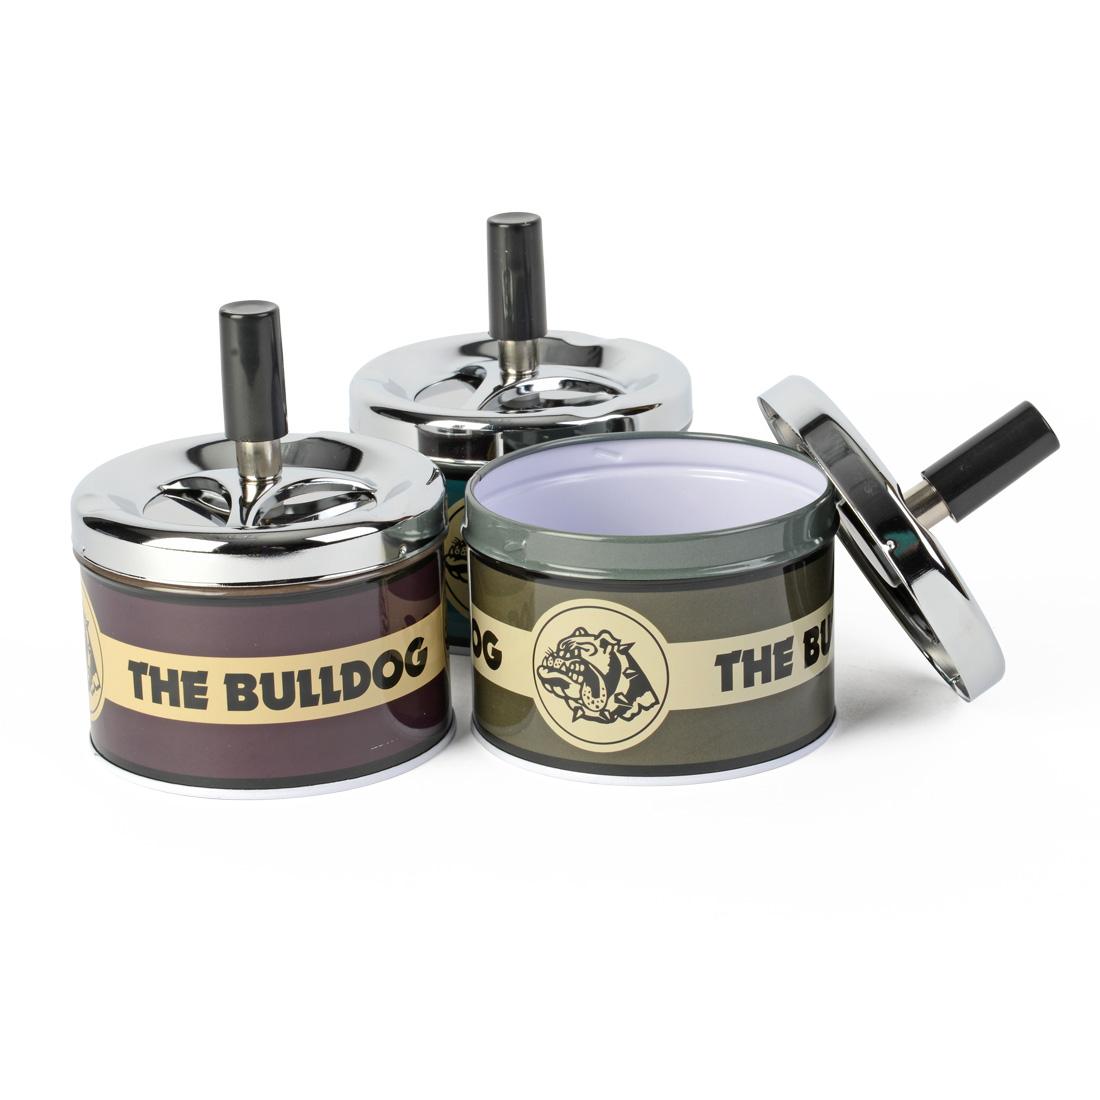 cendrier the bulldog poussoir